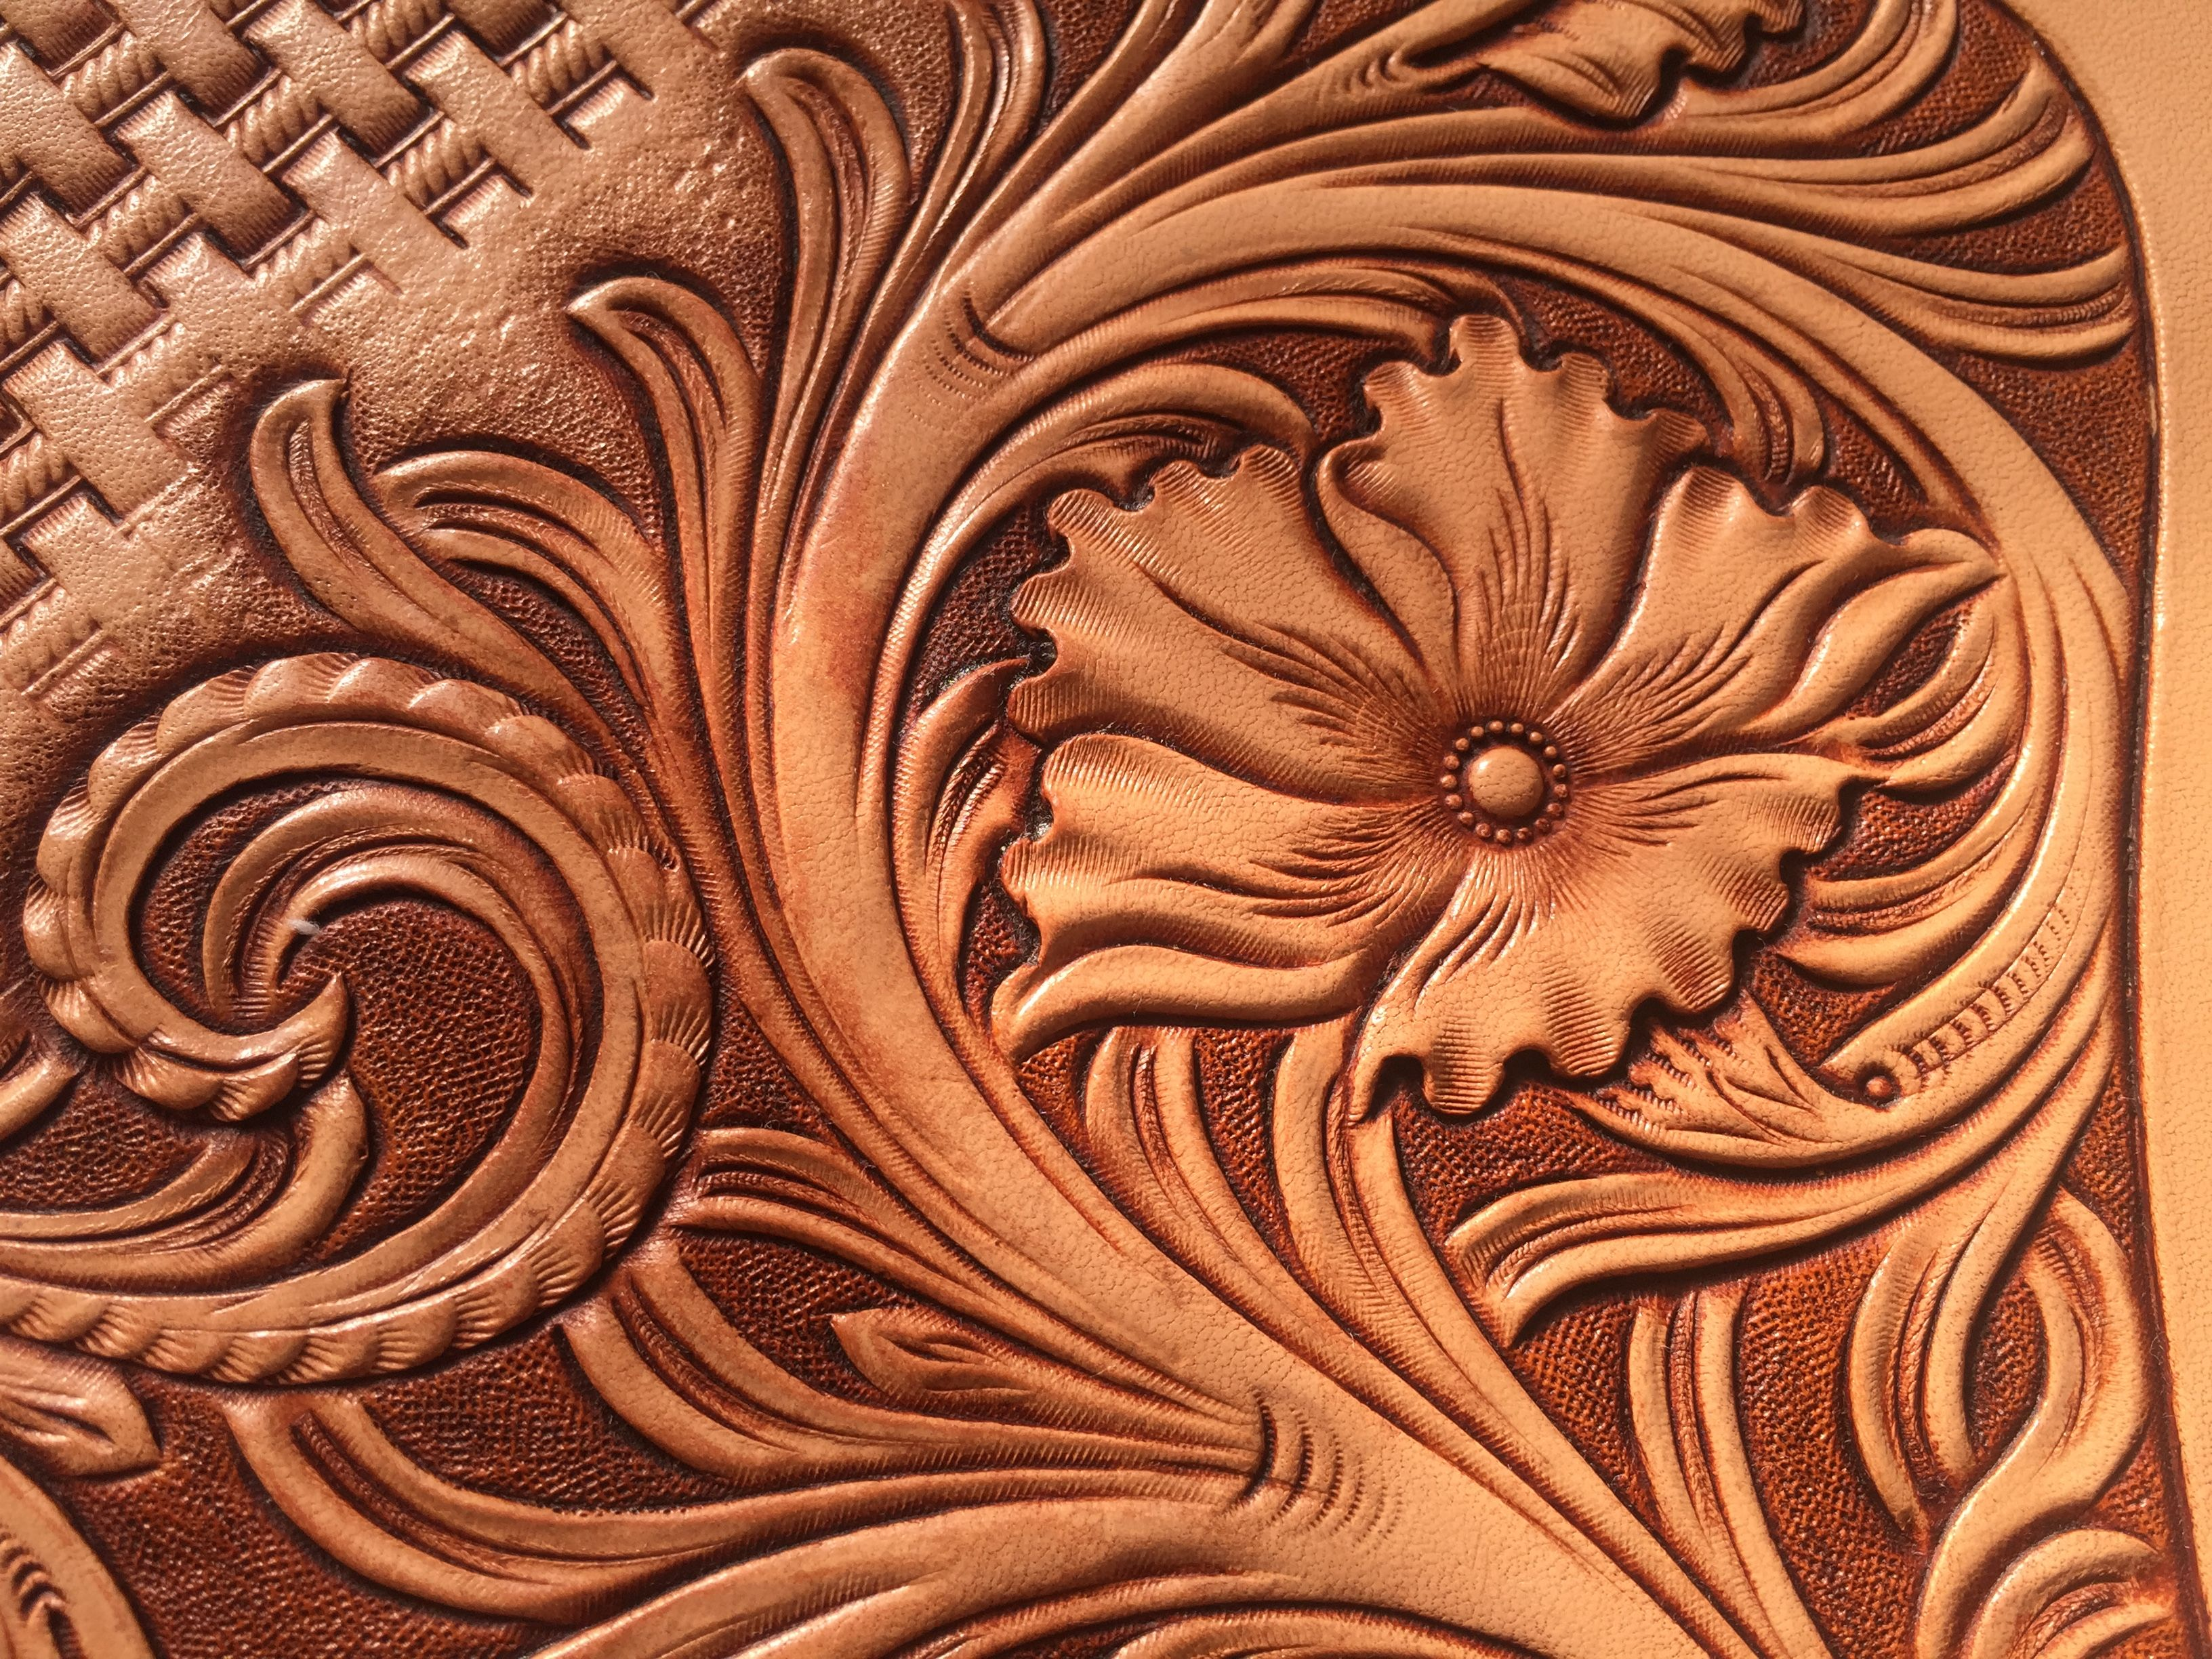 Carvings leatherow bästa leather carving idéerna på